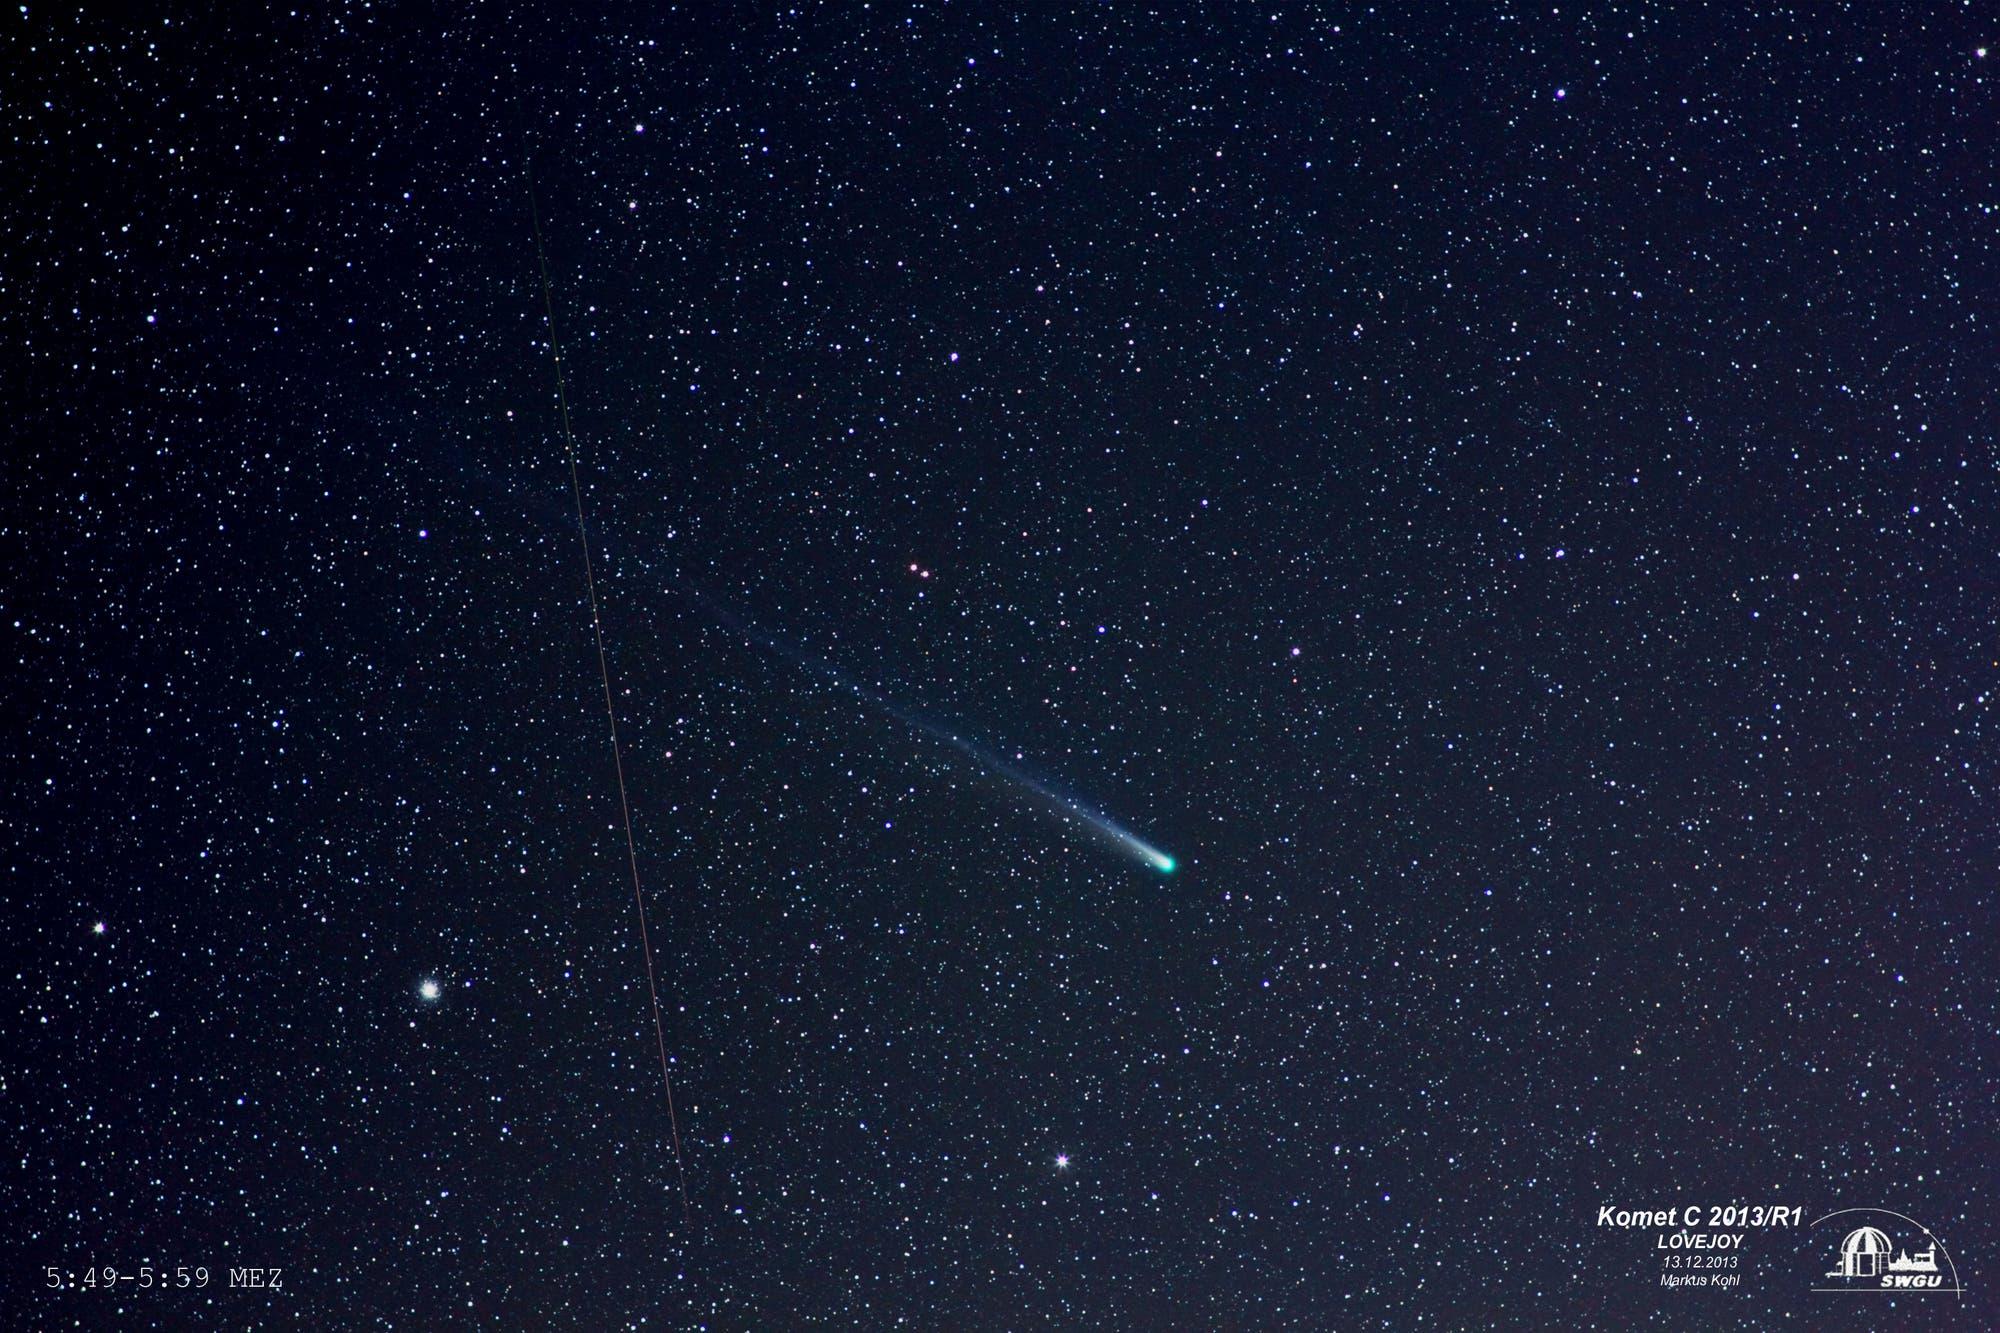 Komet C2013/R1 Lovejoy mit Geminiden-Meteor